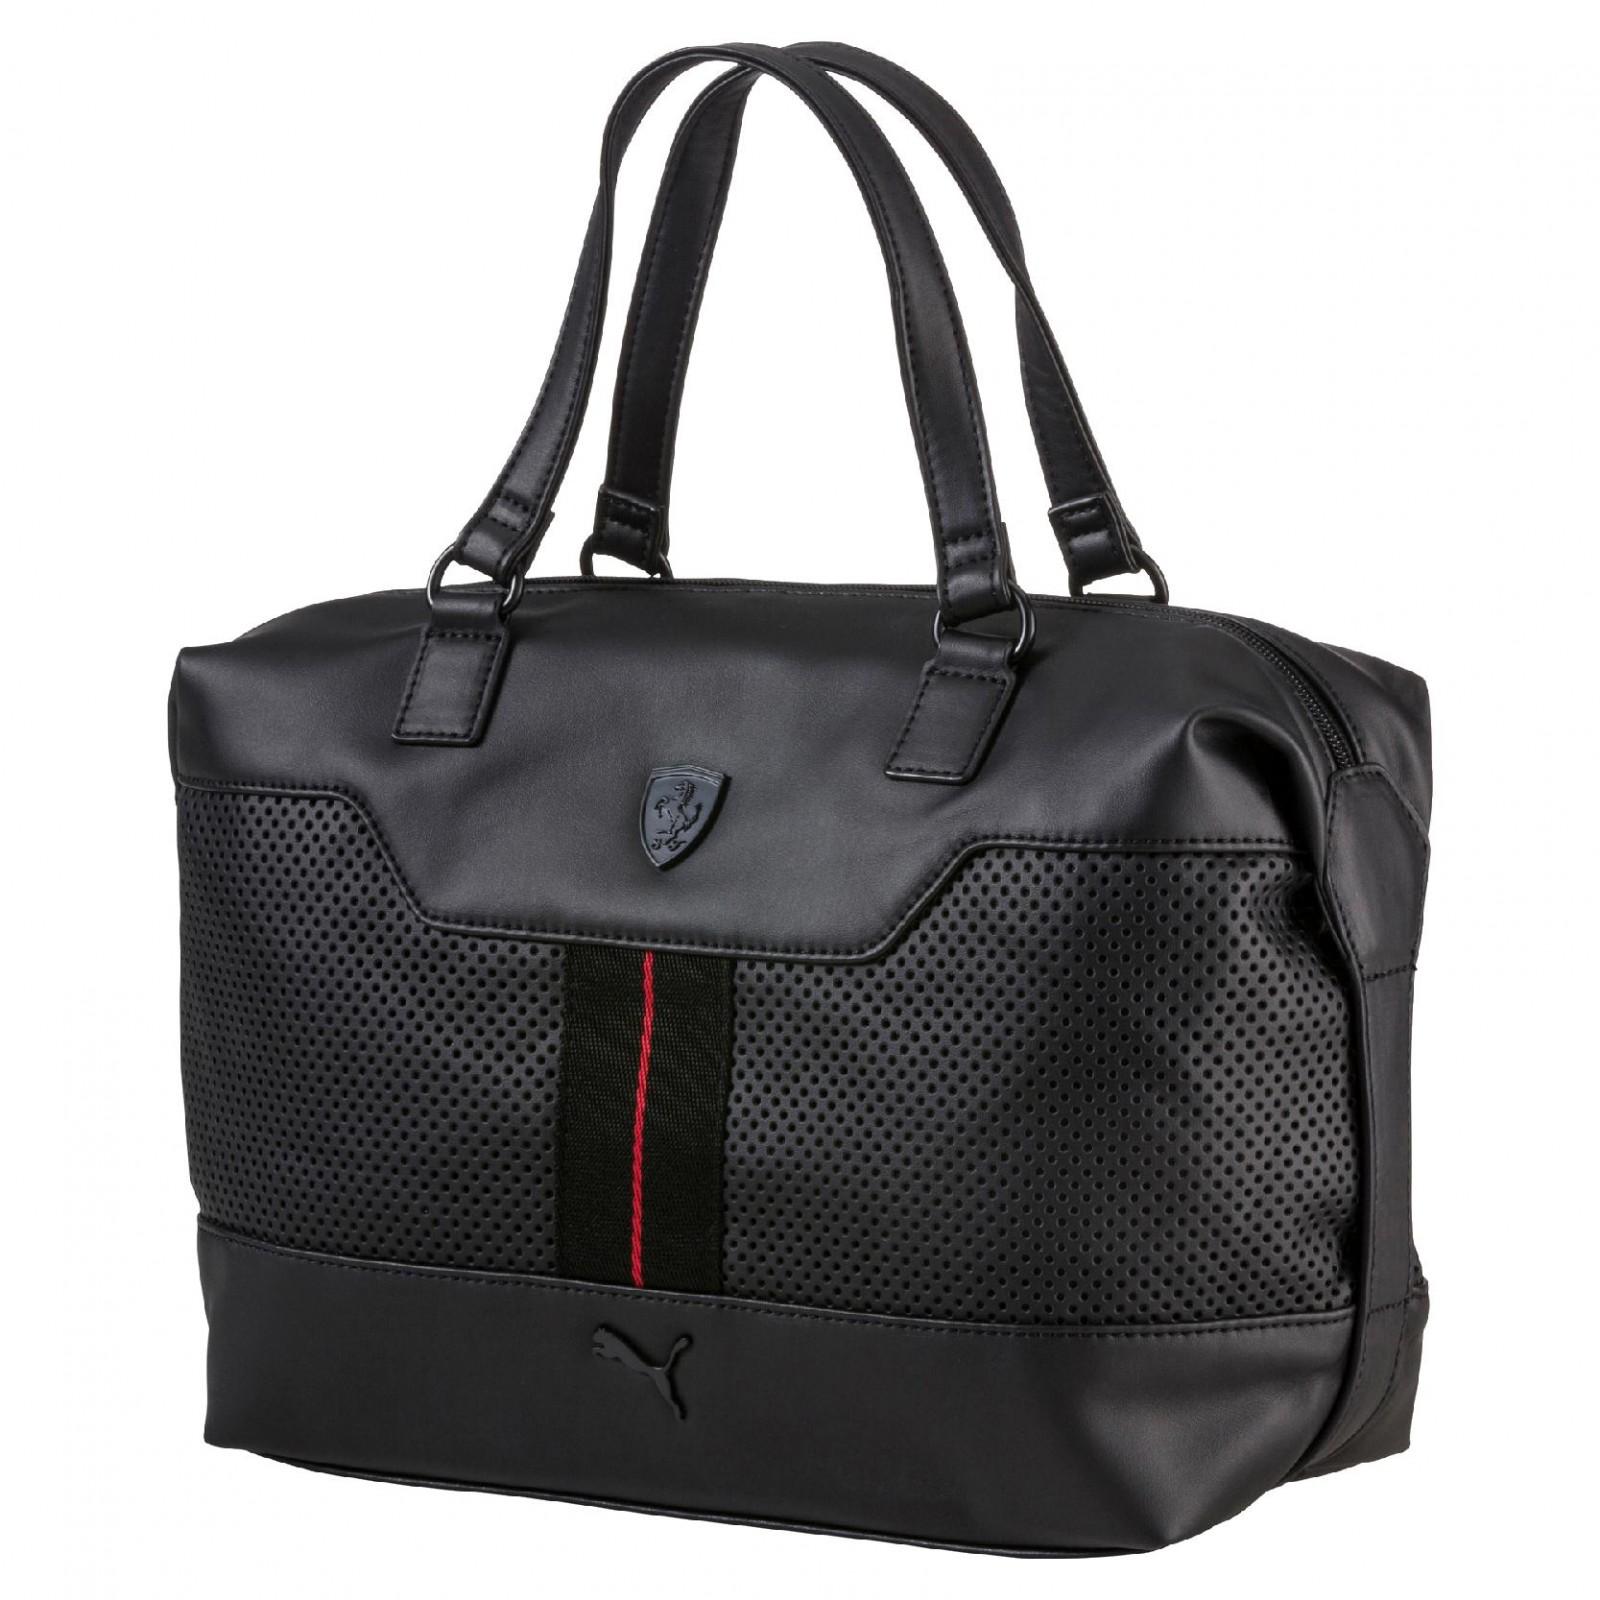 02ddf0e548 Dámská taška Puma Ferrari Ferrari LS Handbag Puma Black